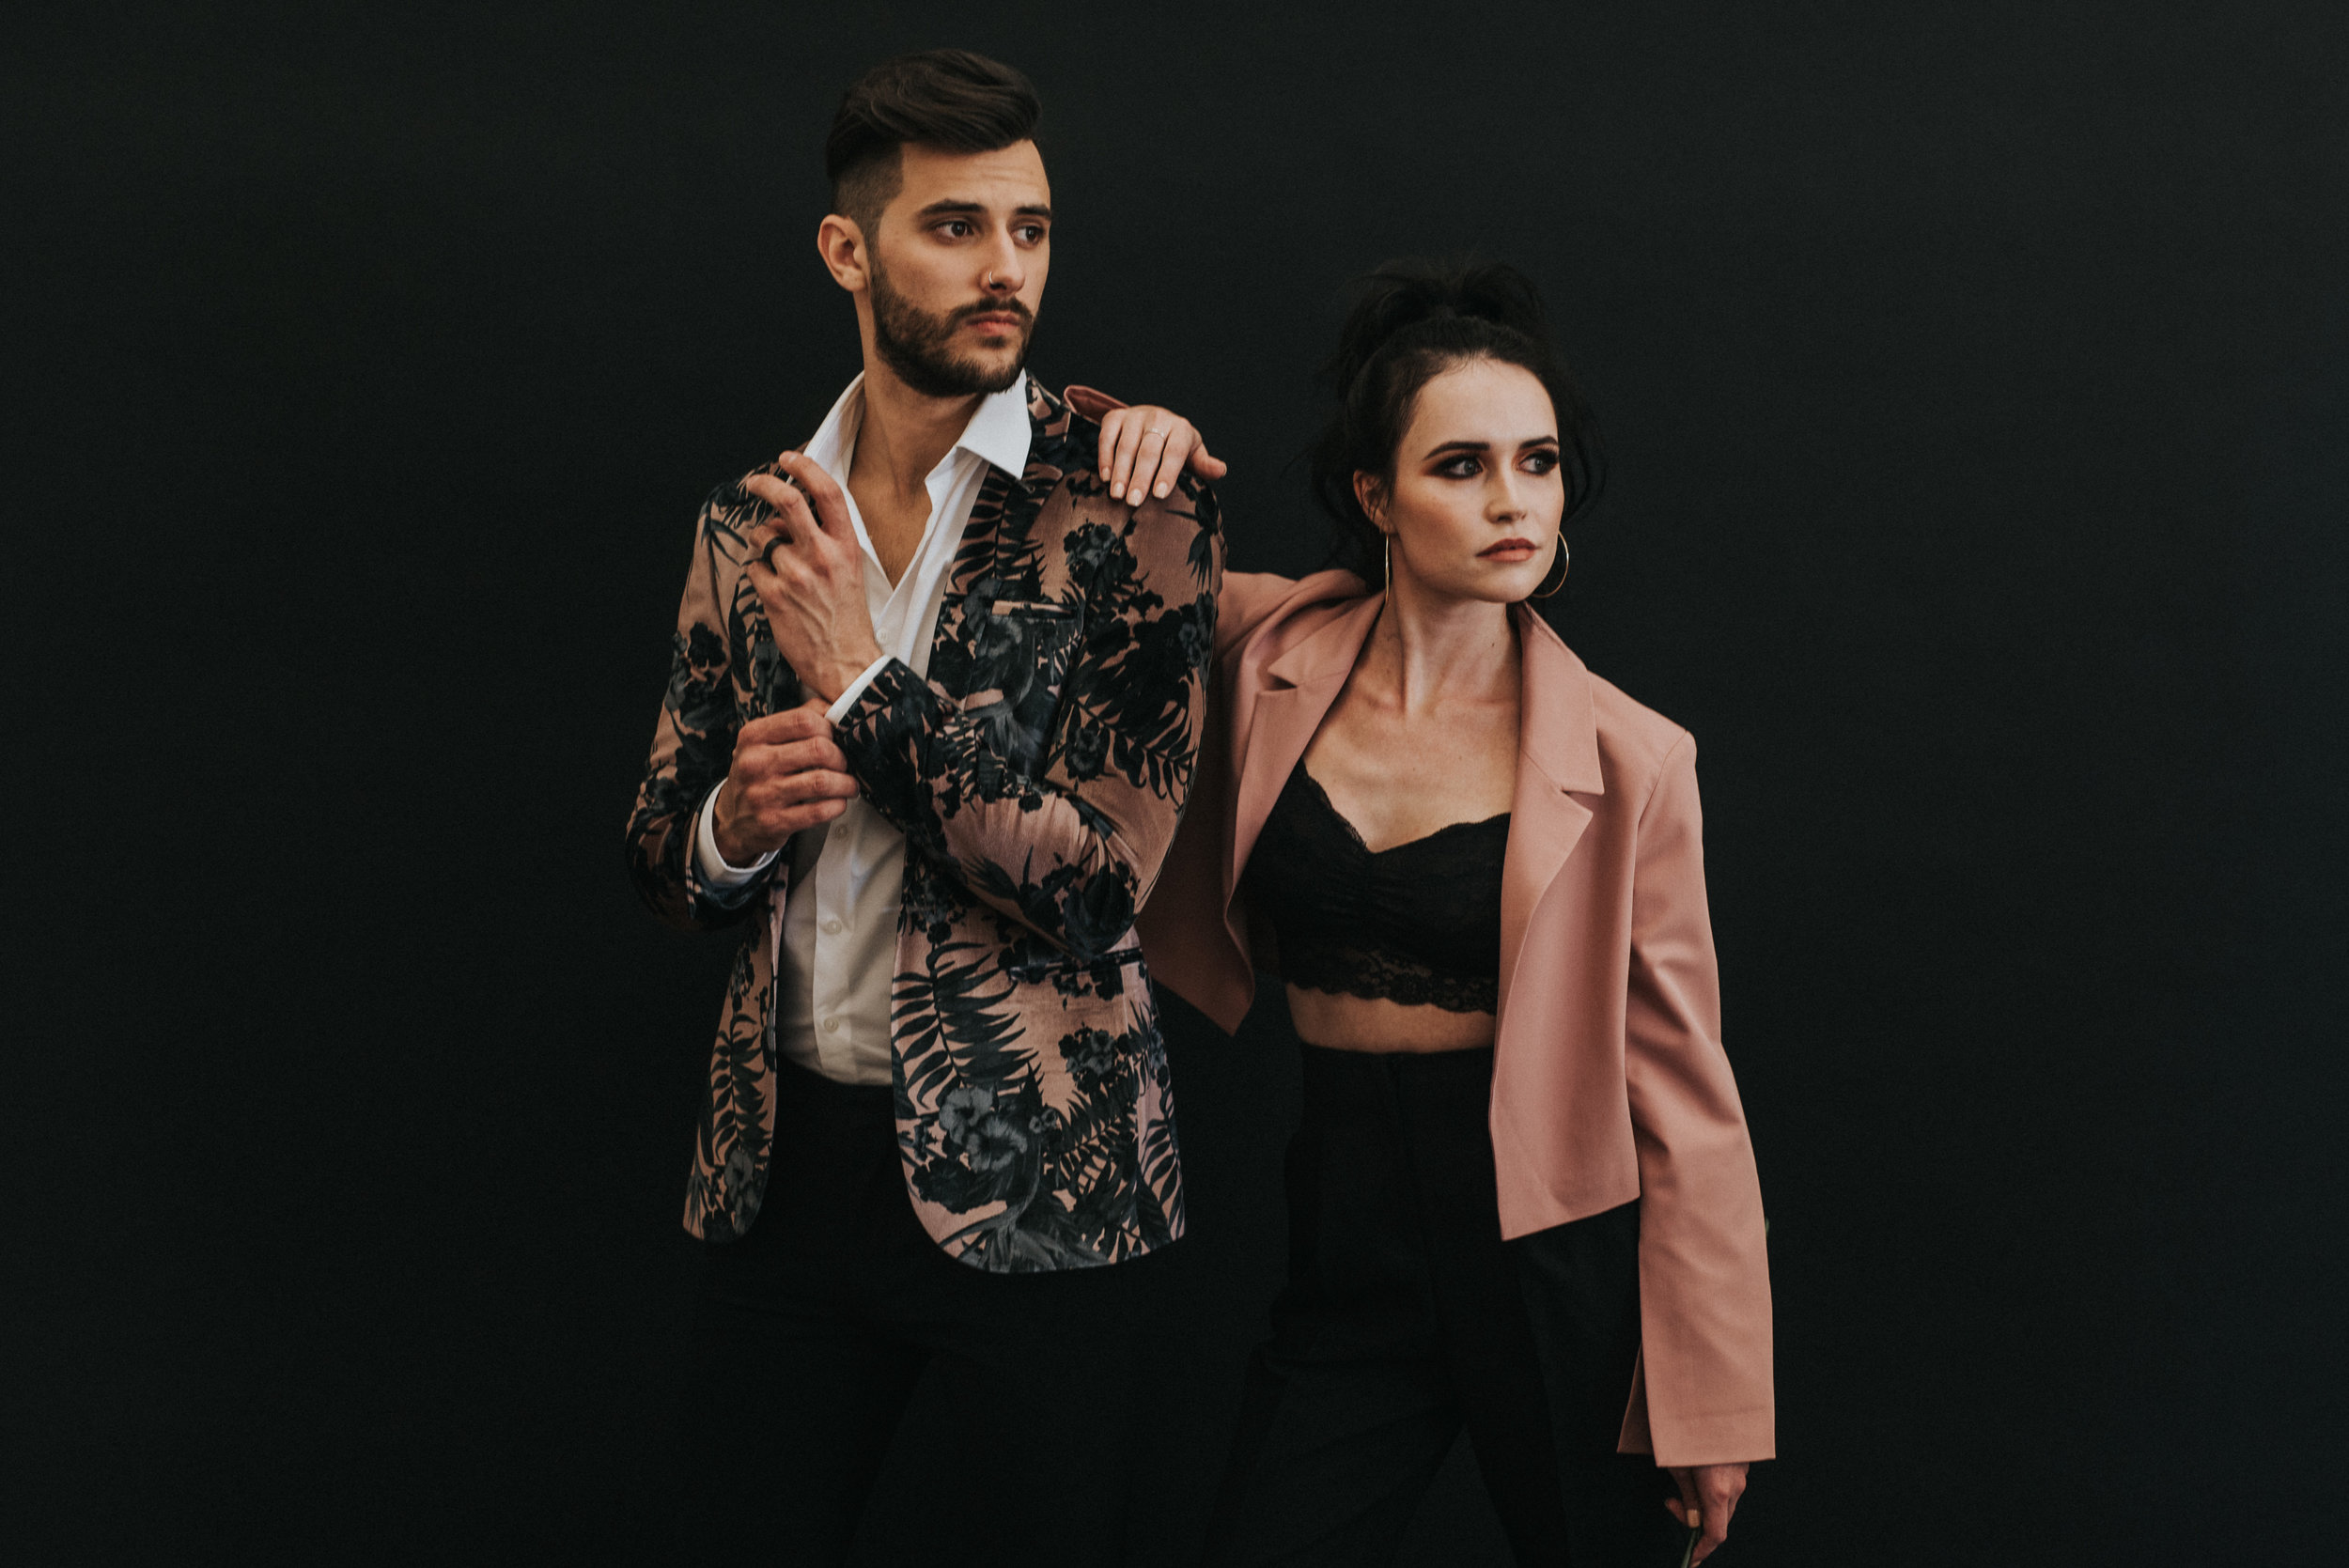 Millennial Pink Inspired Wedding - Groom and Groomslady